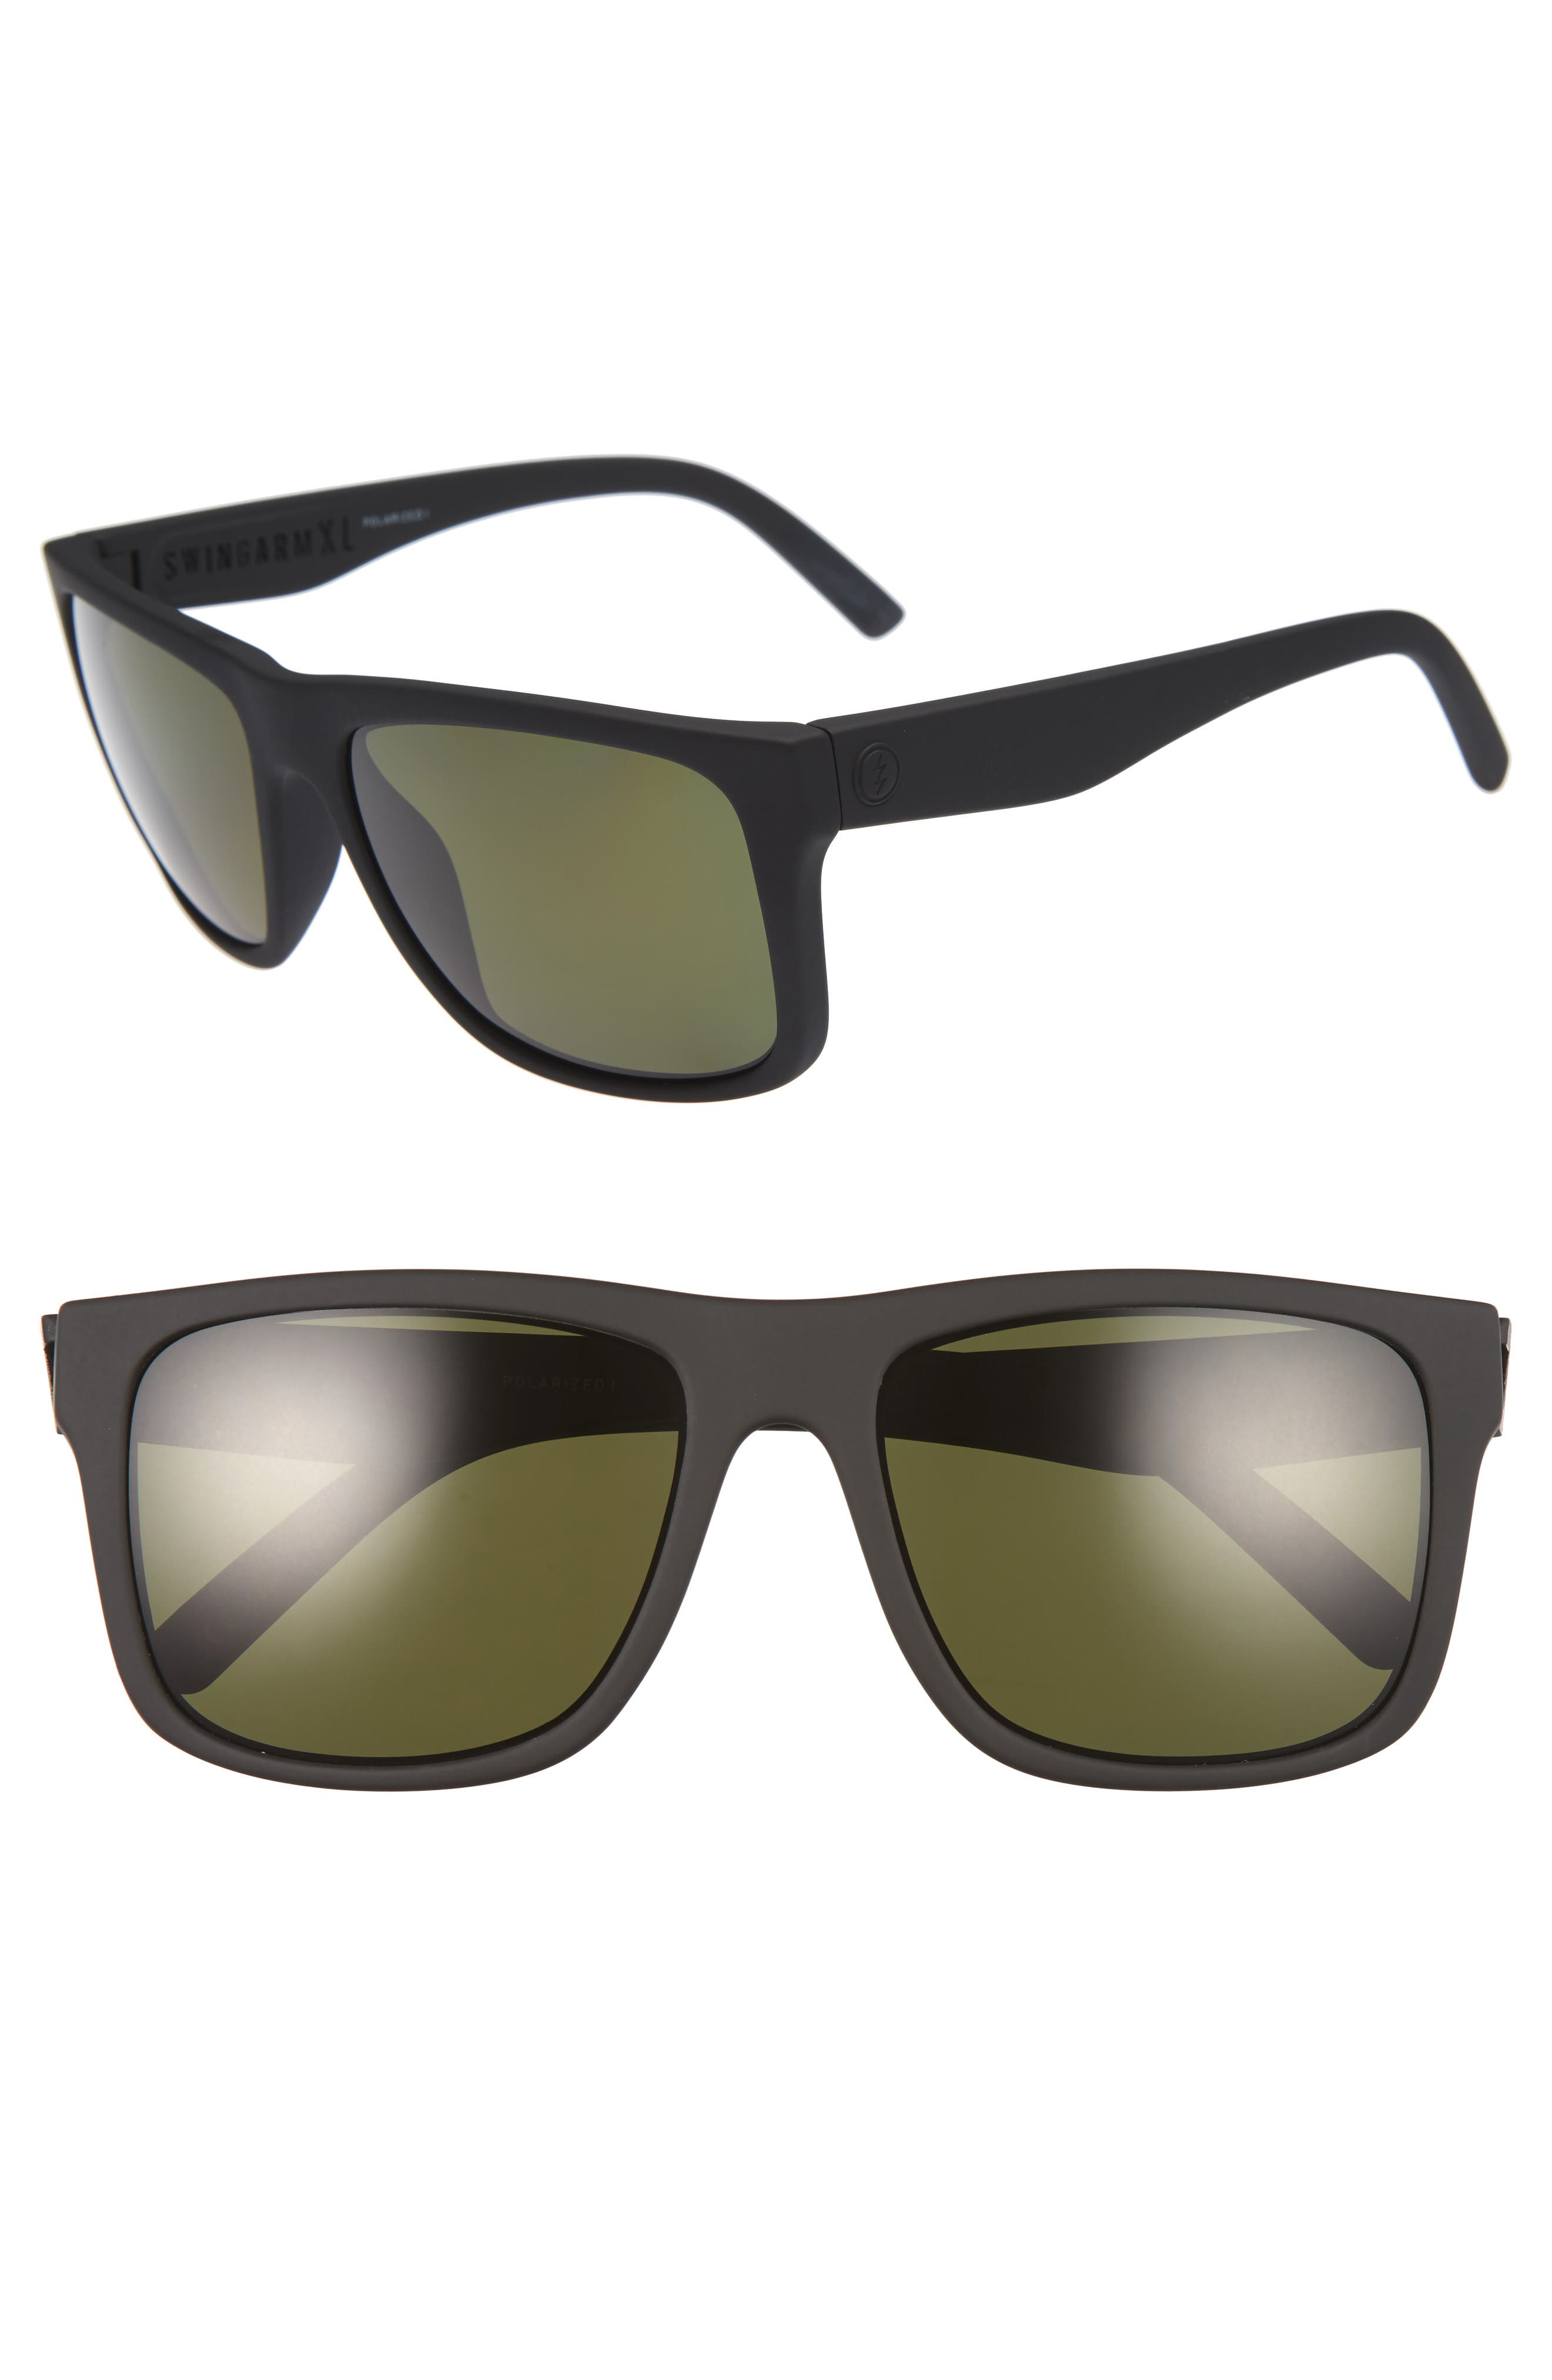 Swingarm XL 59mm Polarized Sunglasses,                         Main,                         color, 001